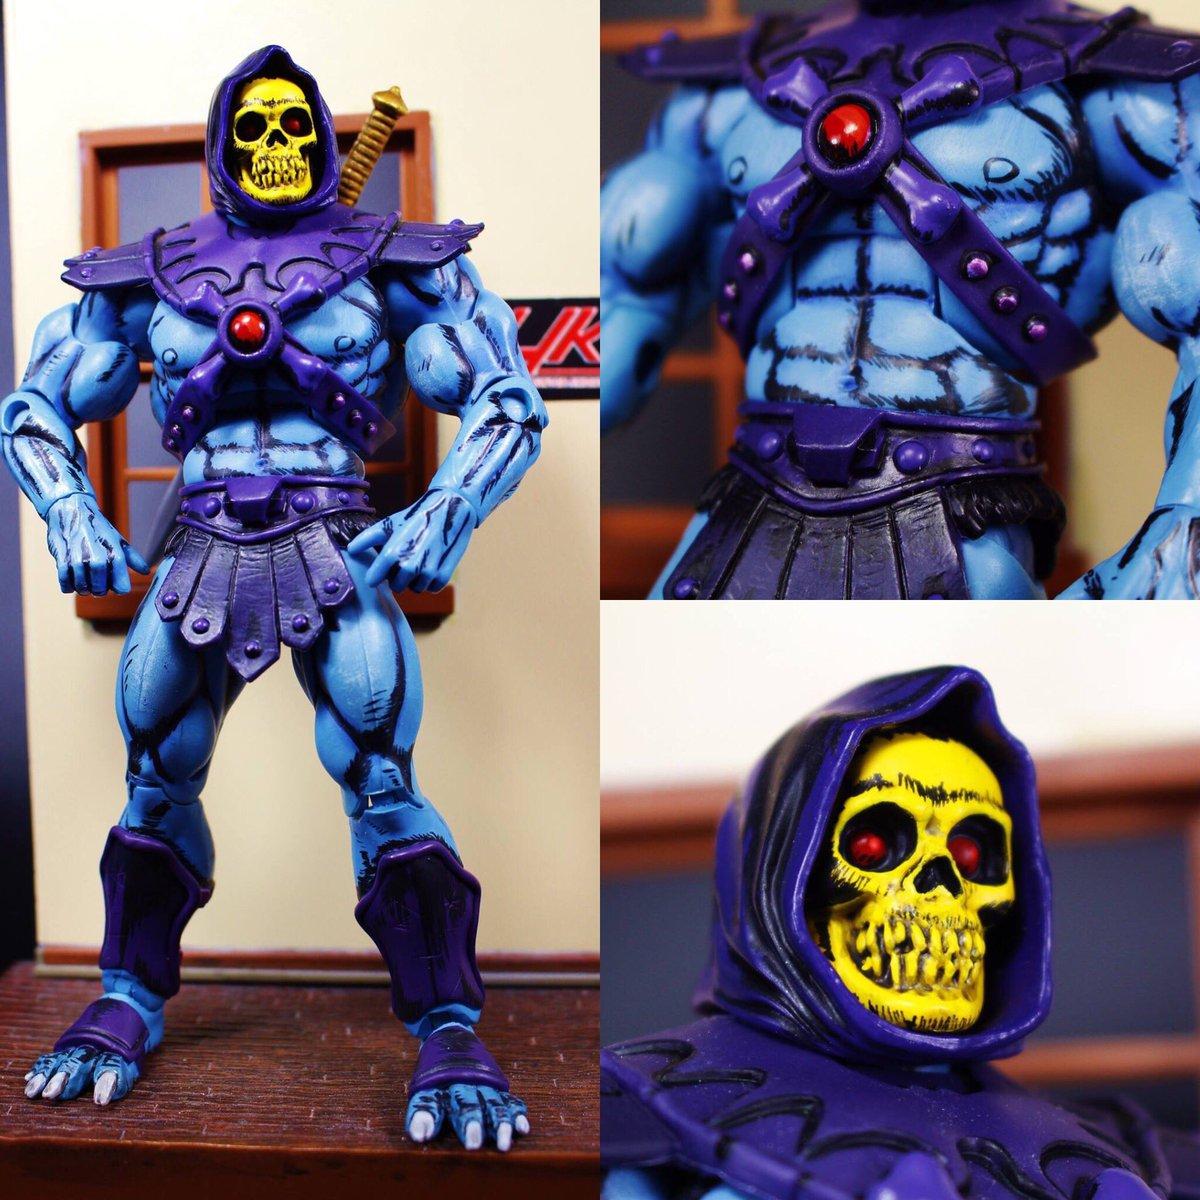 Here is a closer look at the details of my #custom cel shaded mini-comic #Skeletor  #motuc  #HeMan  #HKC<br>http://pic.twitter.com/AuTTSMelJJ